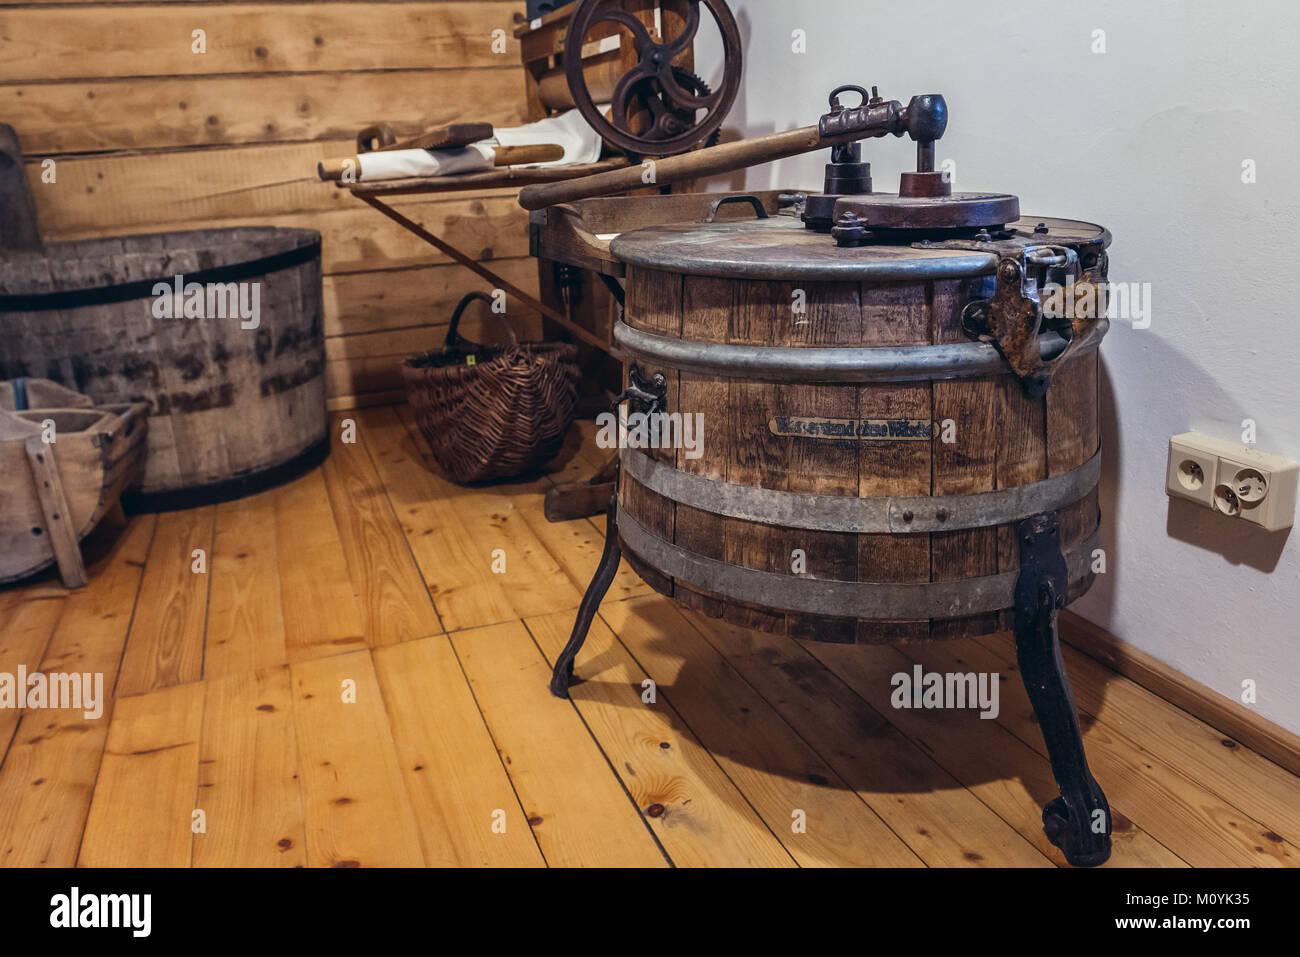 washing machine antique photos washing machine antique images alamy. Black Bedroom Furniture Sets. Home Design Ideas